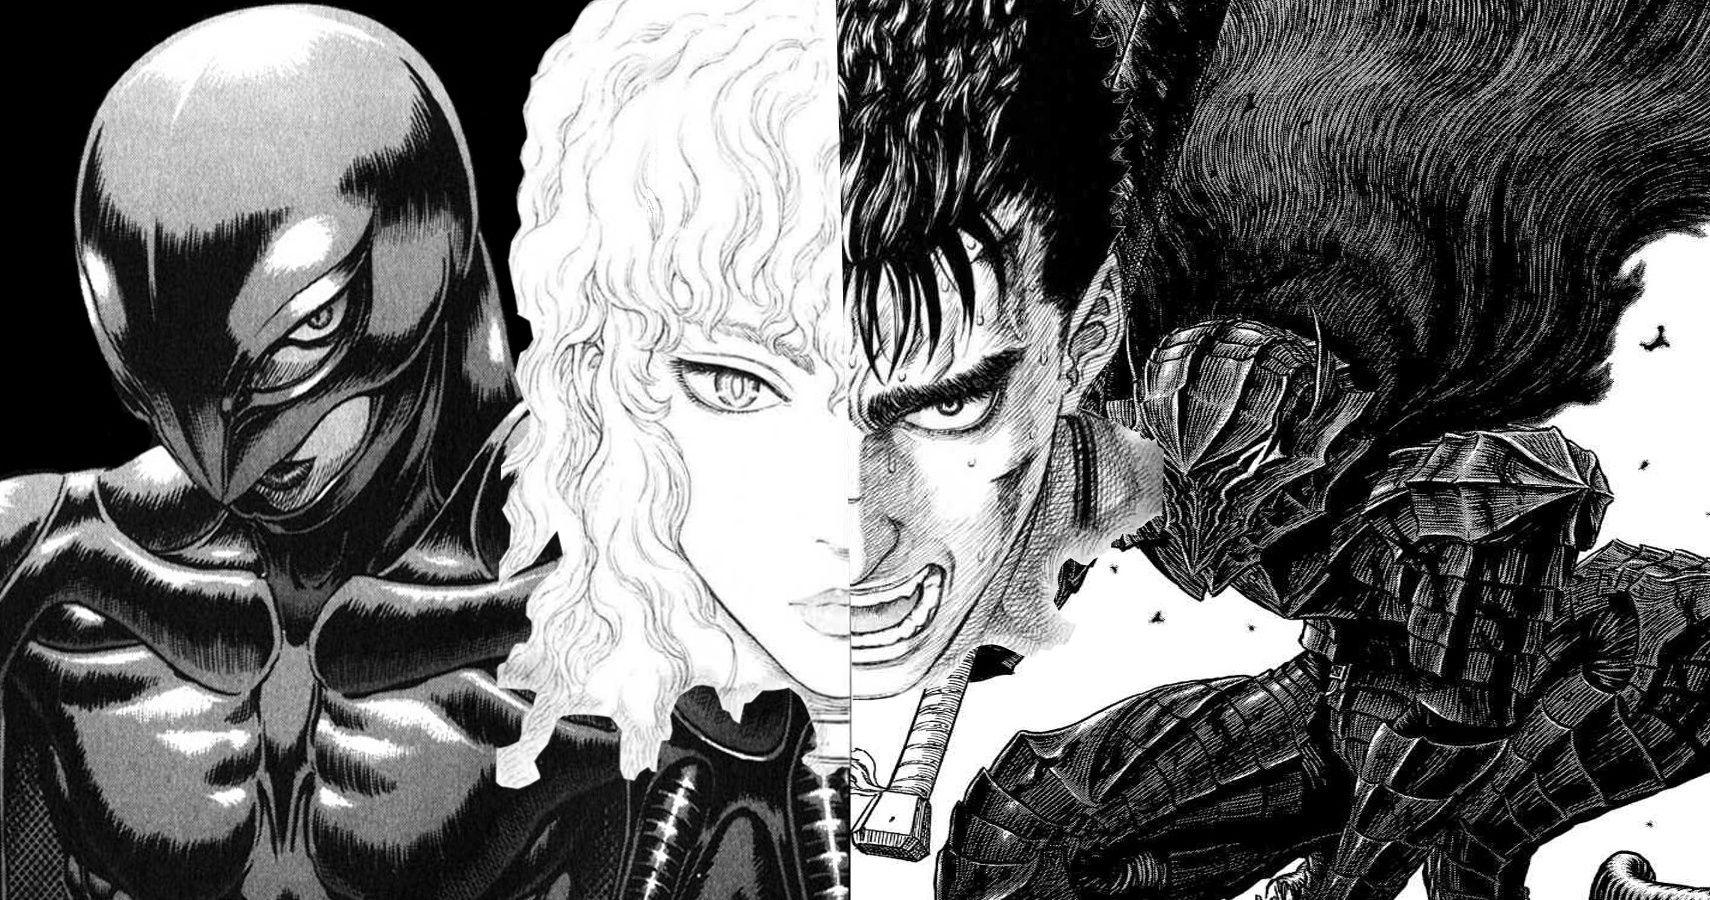 Berserk: 10 Reasons Why It's One Of The Best Manga Ever | CBR